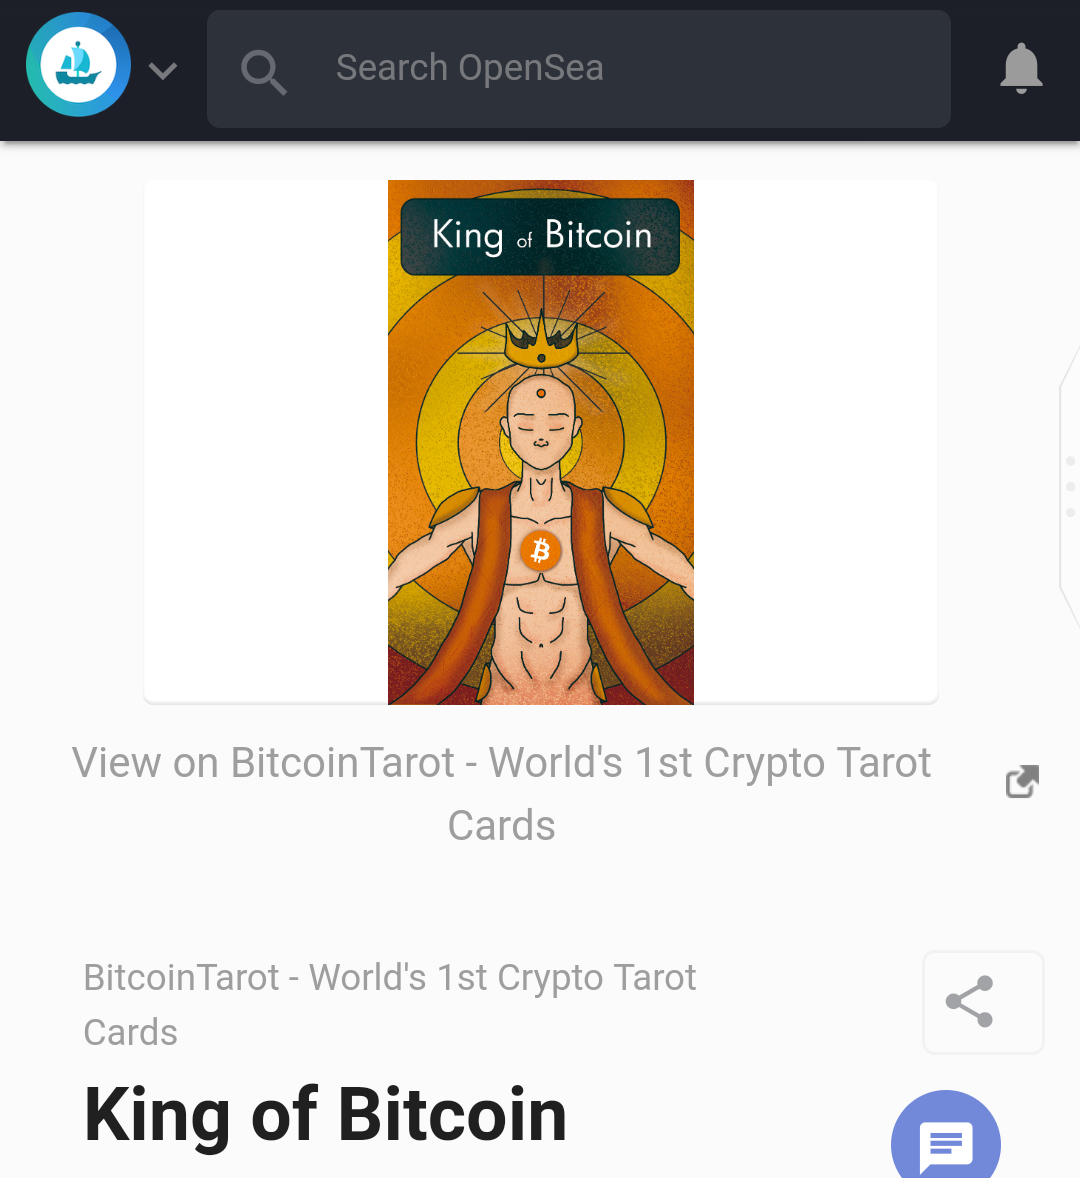 King of Bitcoin digital collectible